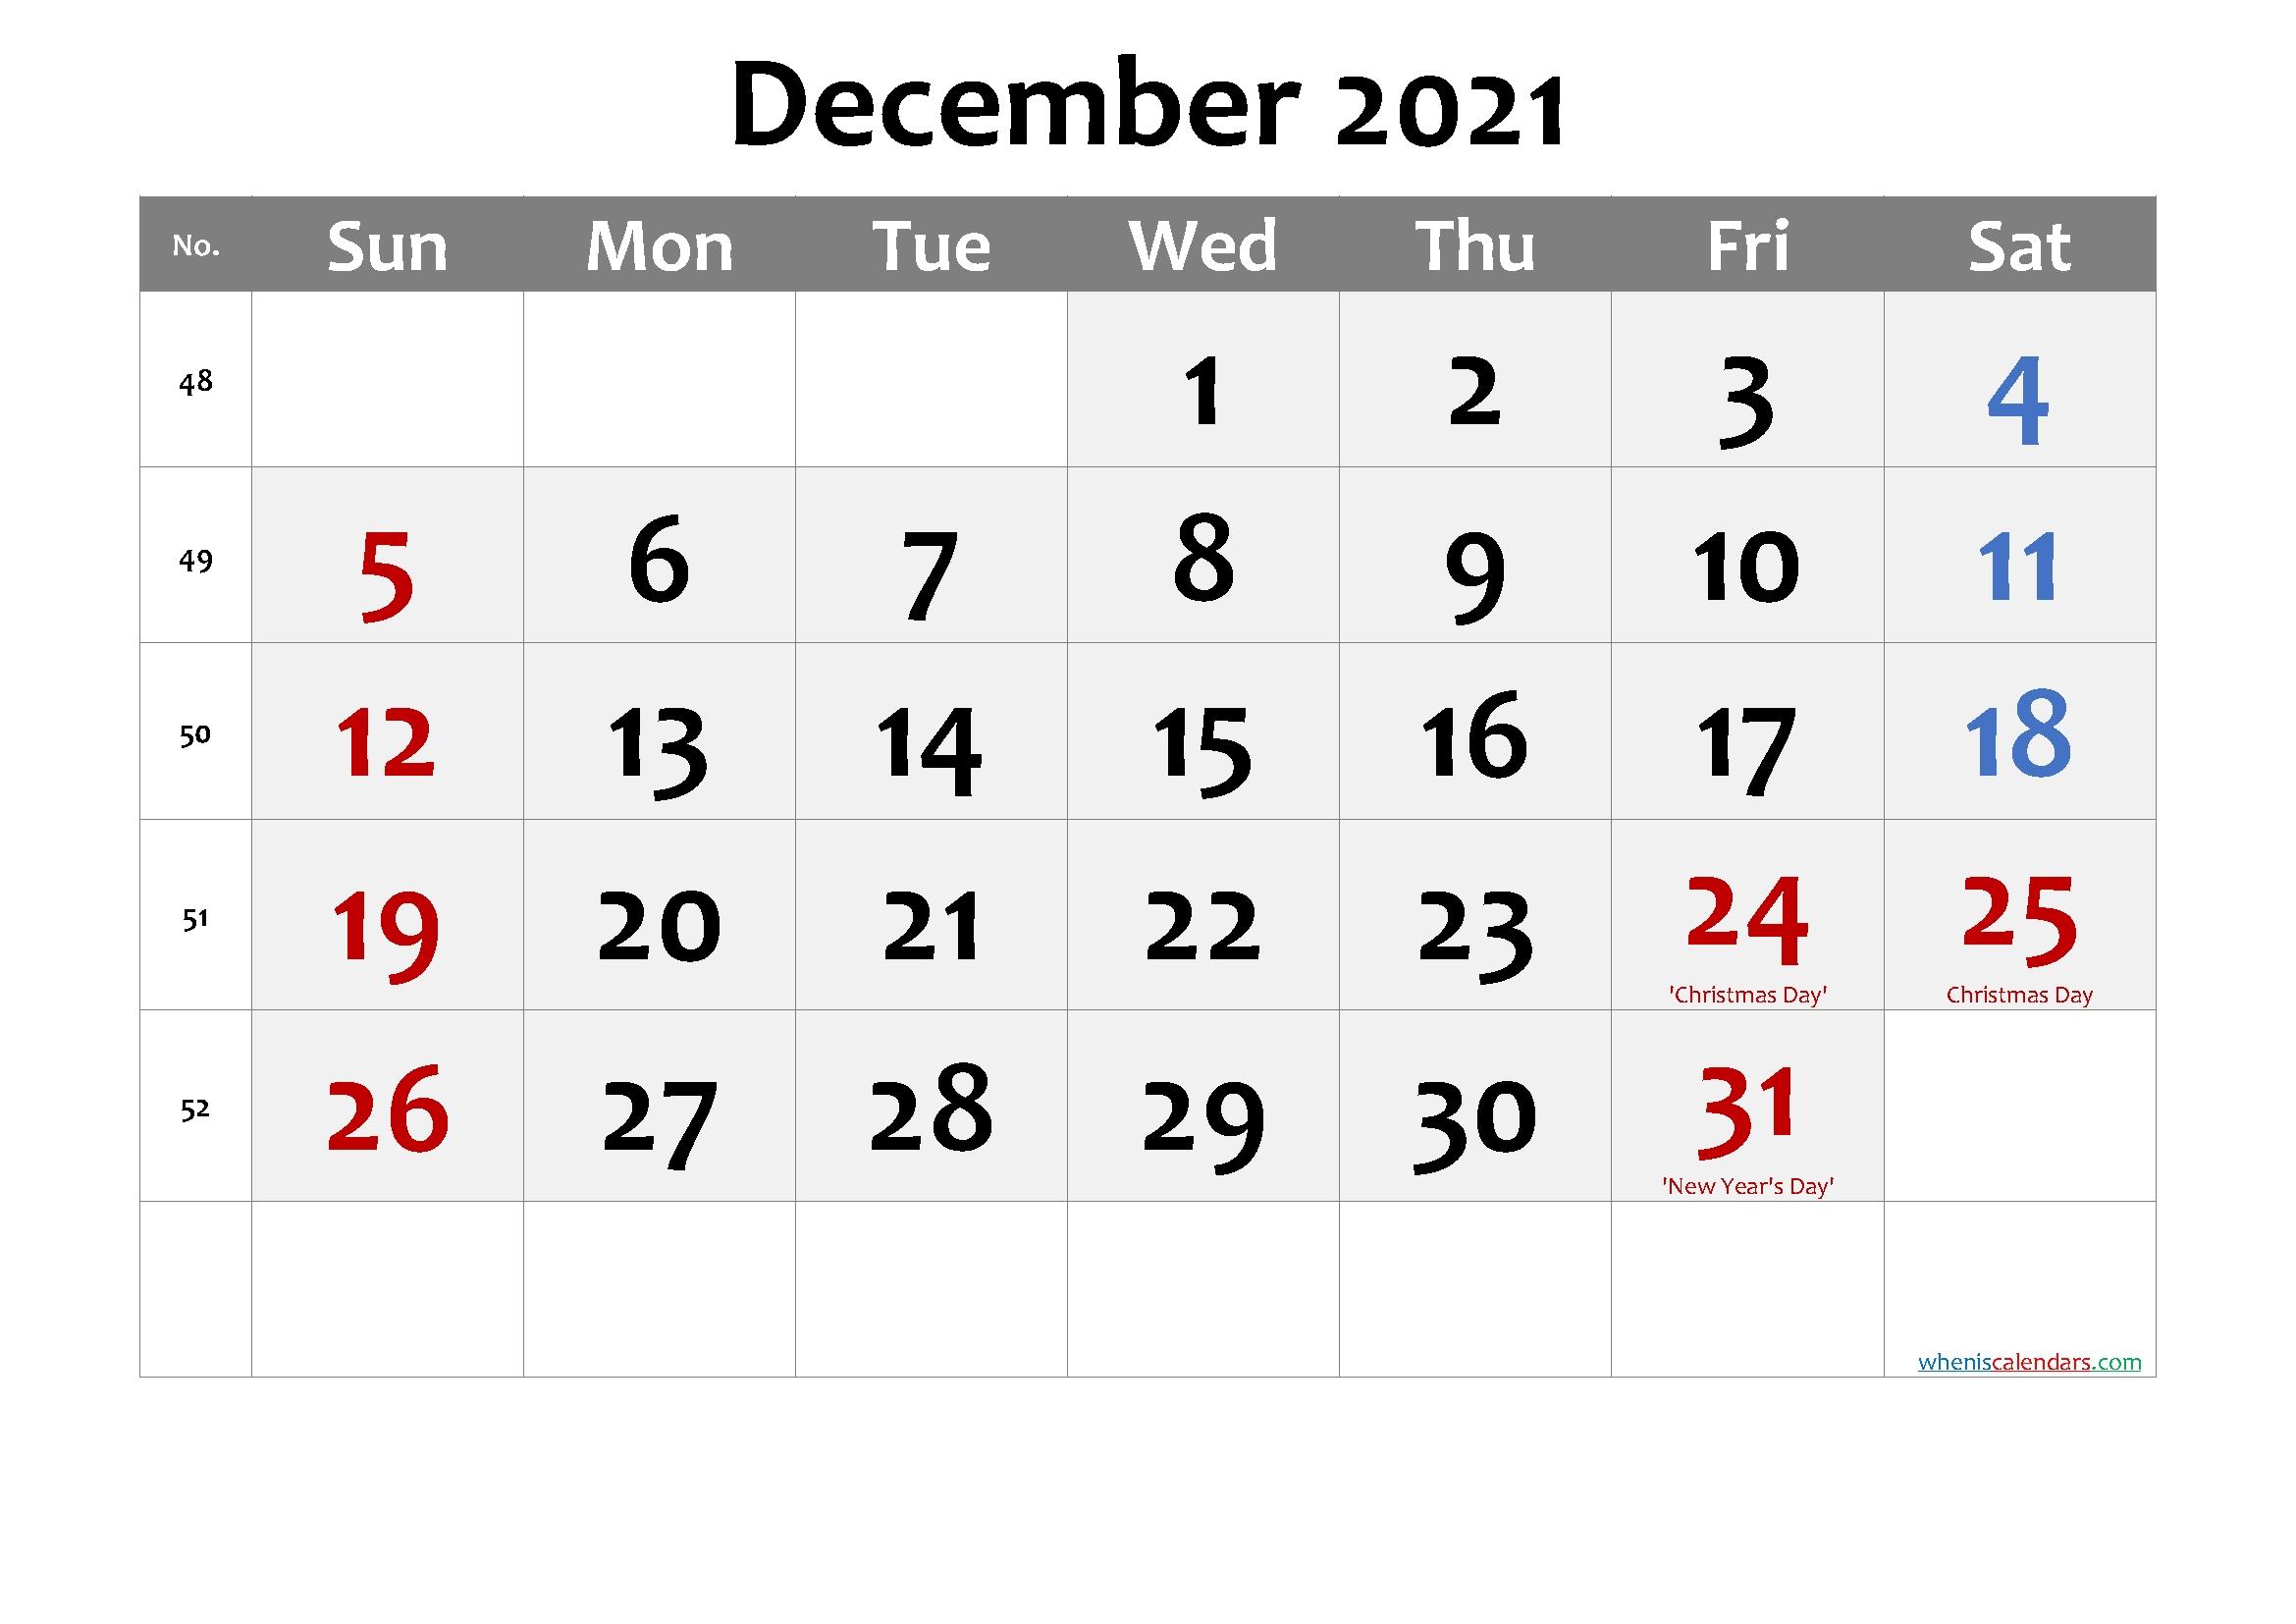 December 2021 Calendar With Holidays | Printable Calendars 2021 December 2021 Calendar Printable